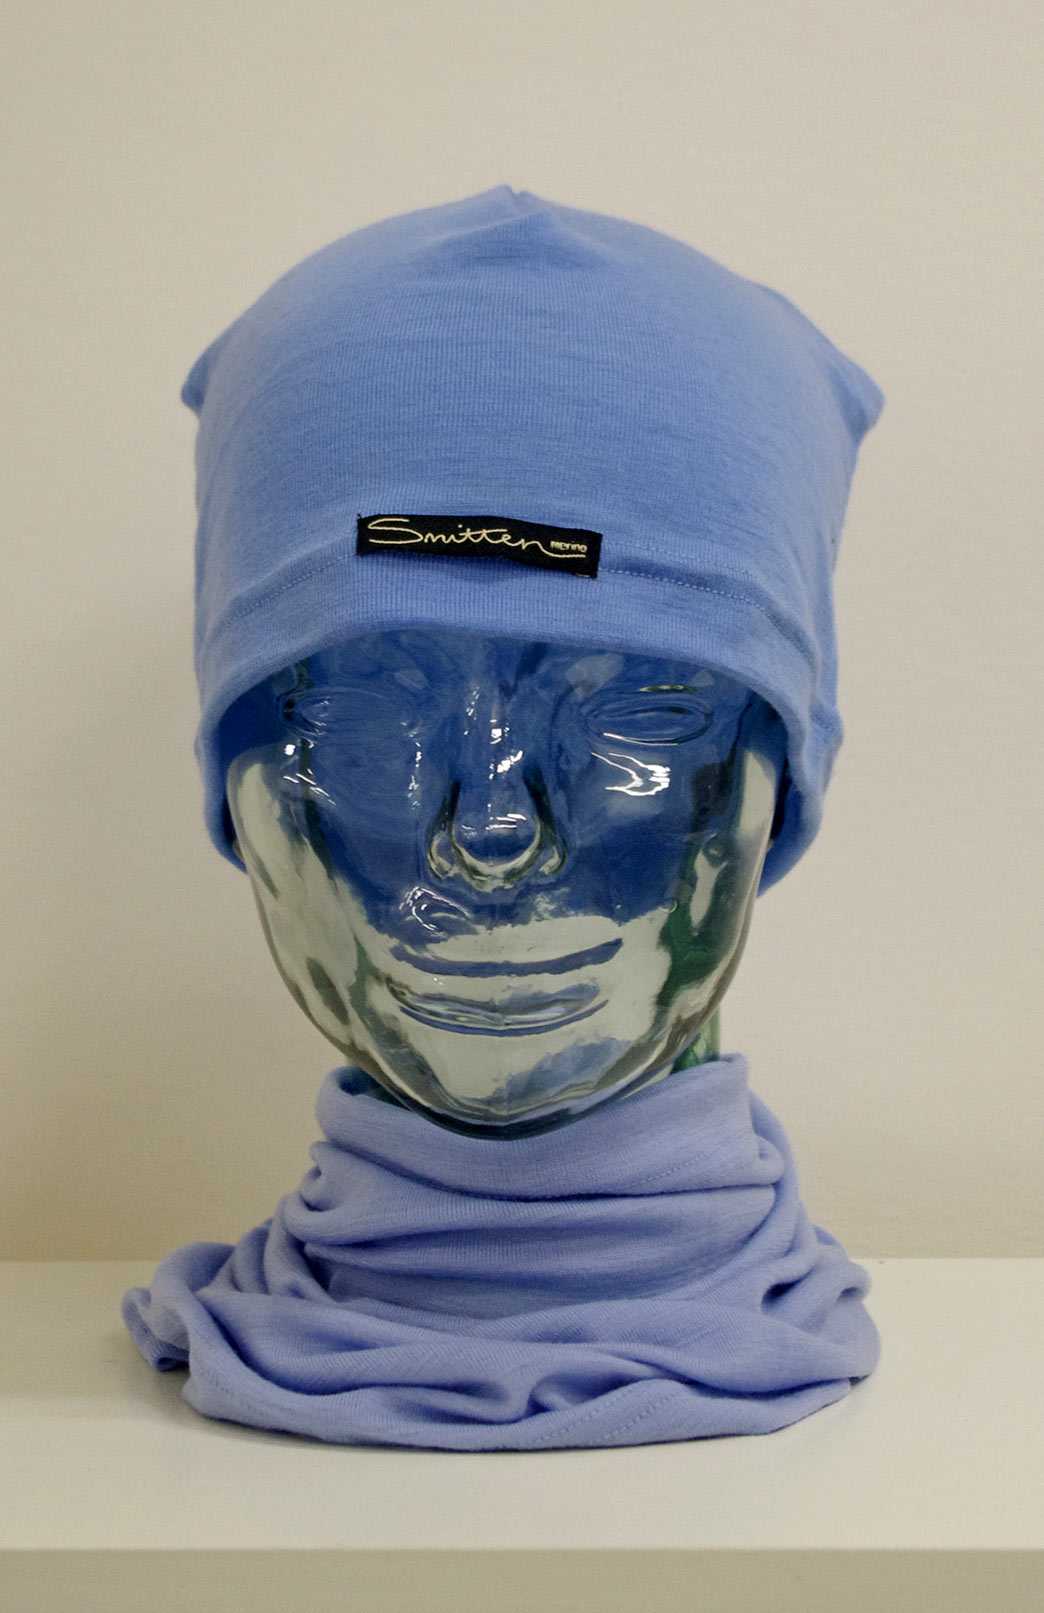 Beanie - Mid-weight Loose Fit Skull Cap - Unisex Light Blue Merino Wool Loose Fit Beanie Skull Cap - Smitten Merino Tasmania Australia